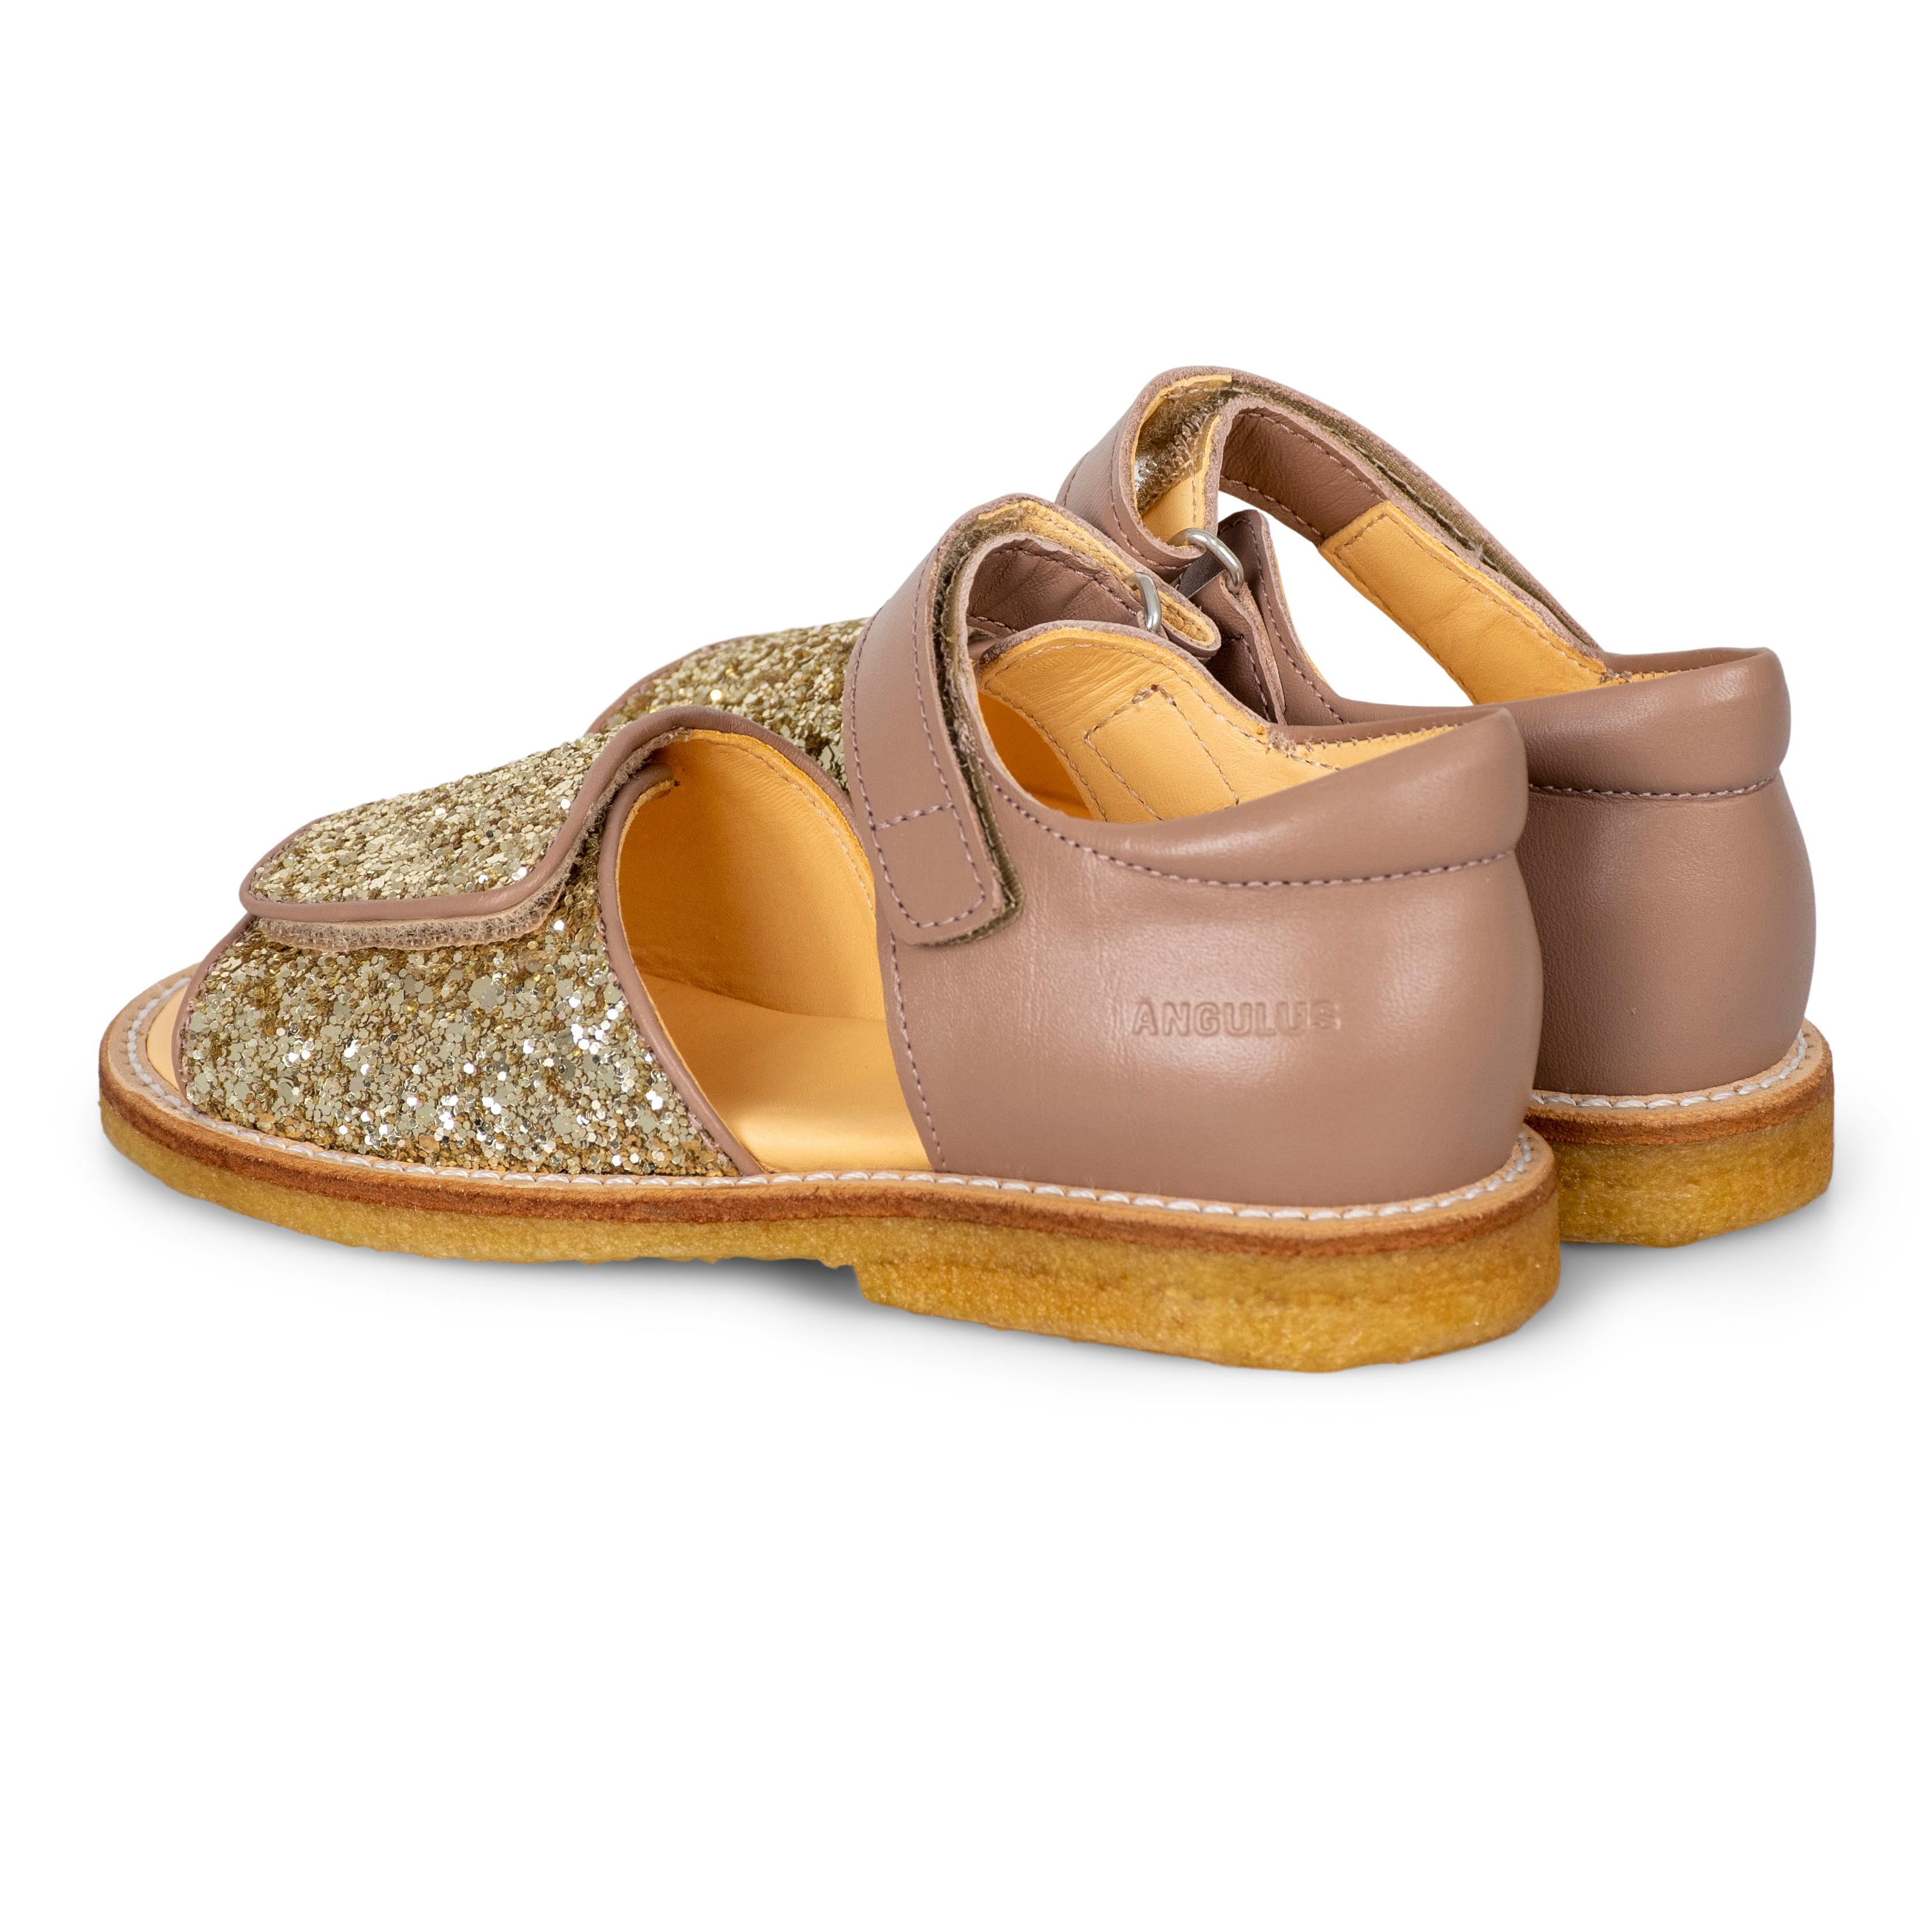 Angulus 0544-101 sandal, guld glimmer, 33